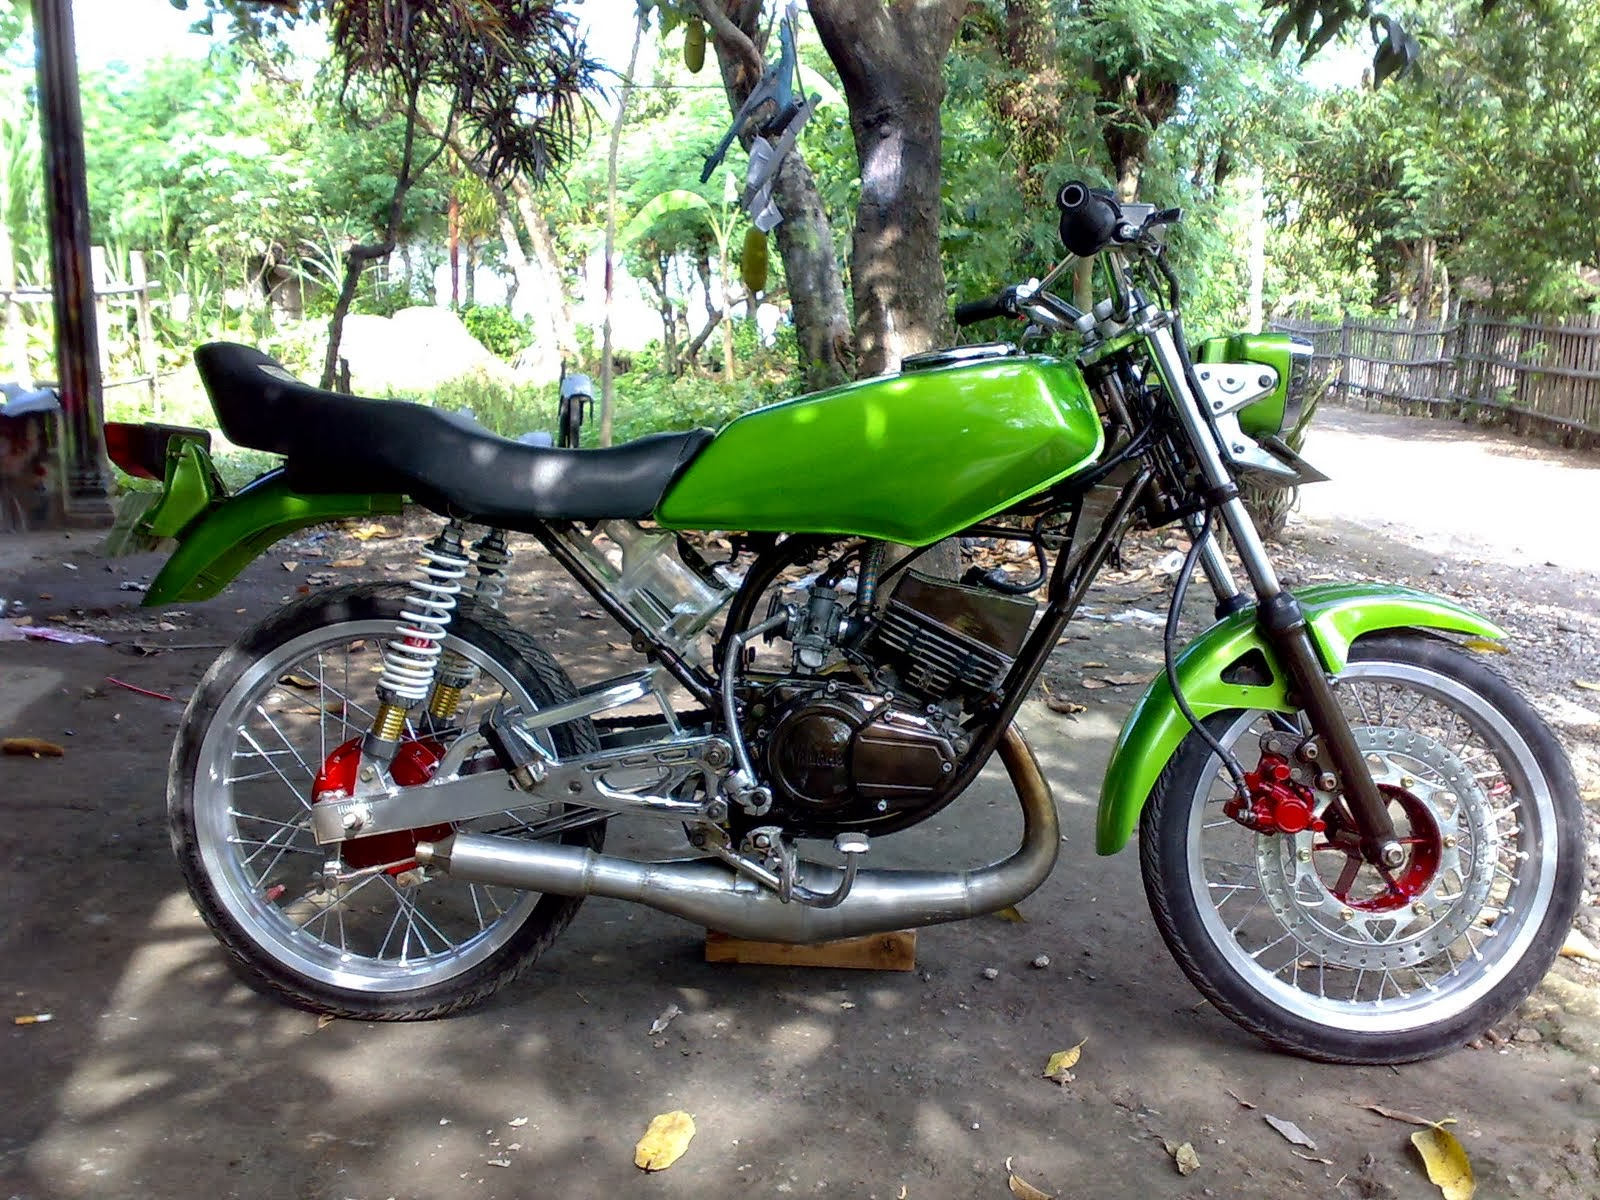 Foto Gambar Modifikasi Motor Rx King Warna Hitam Motor Hitam Warna